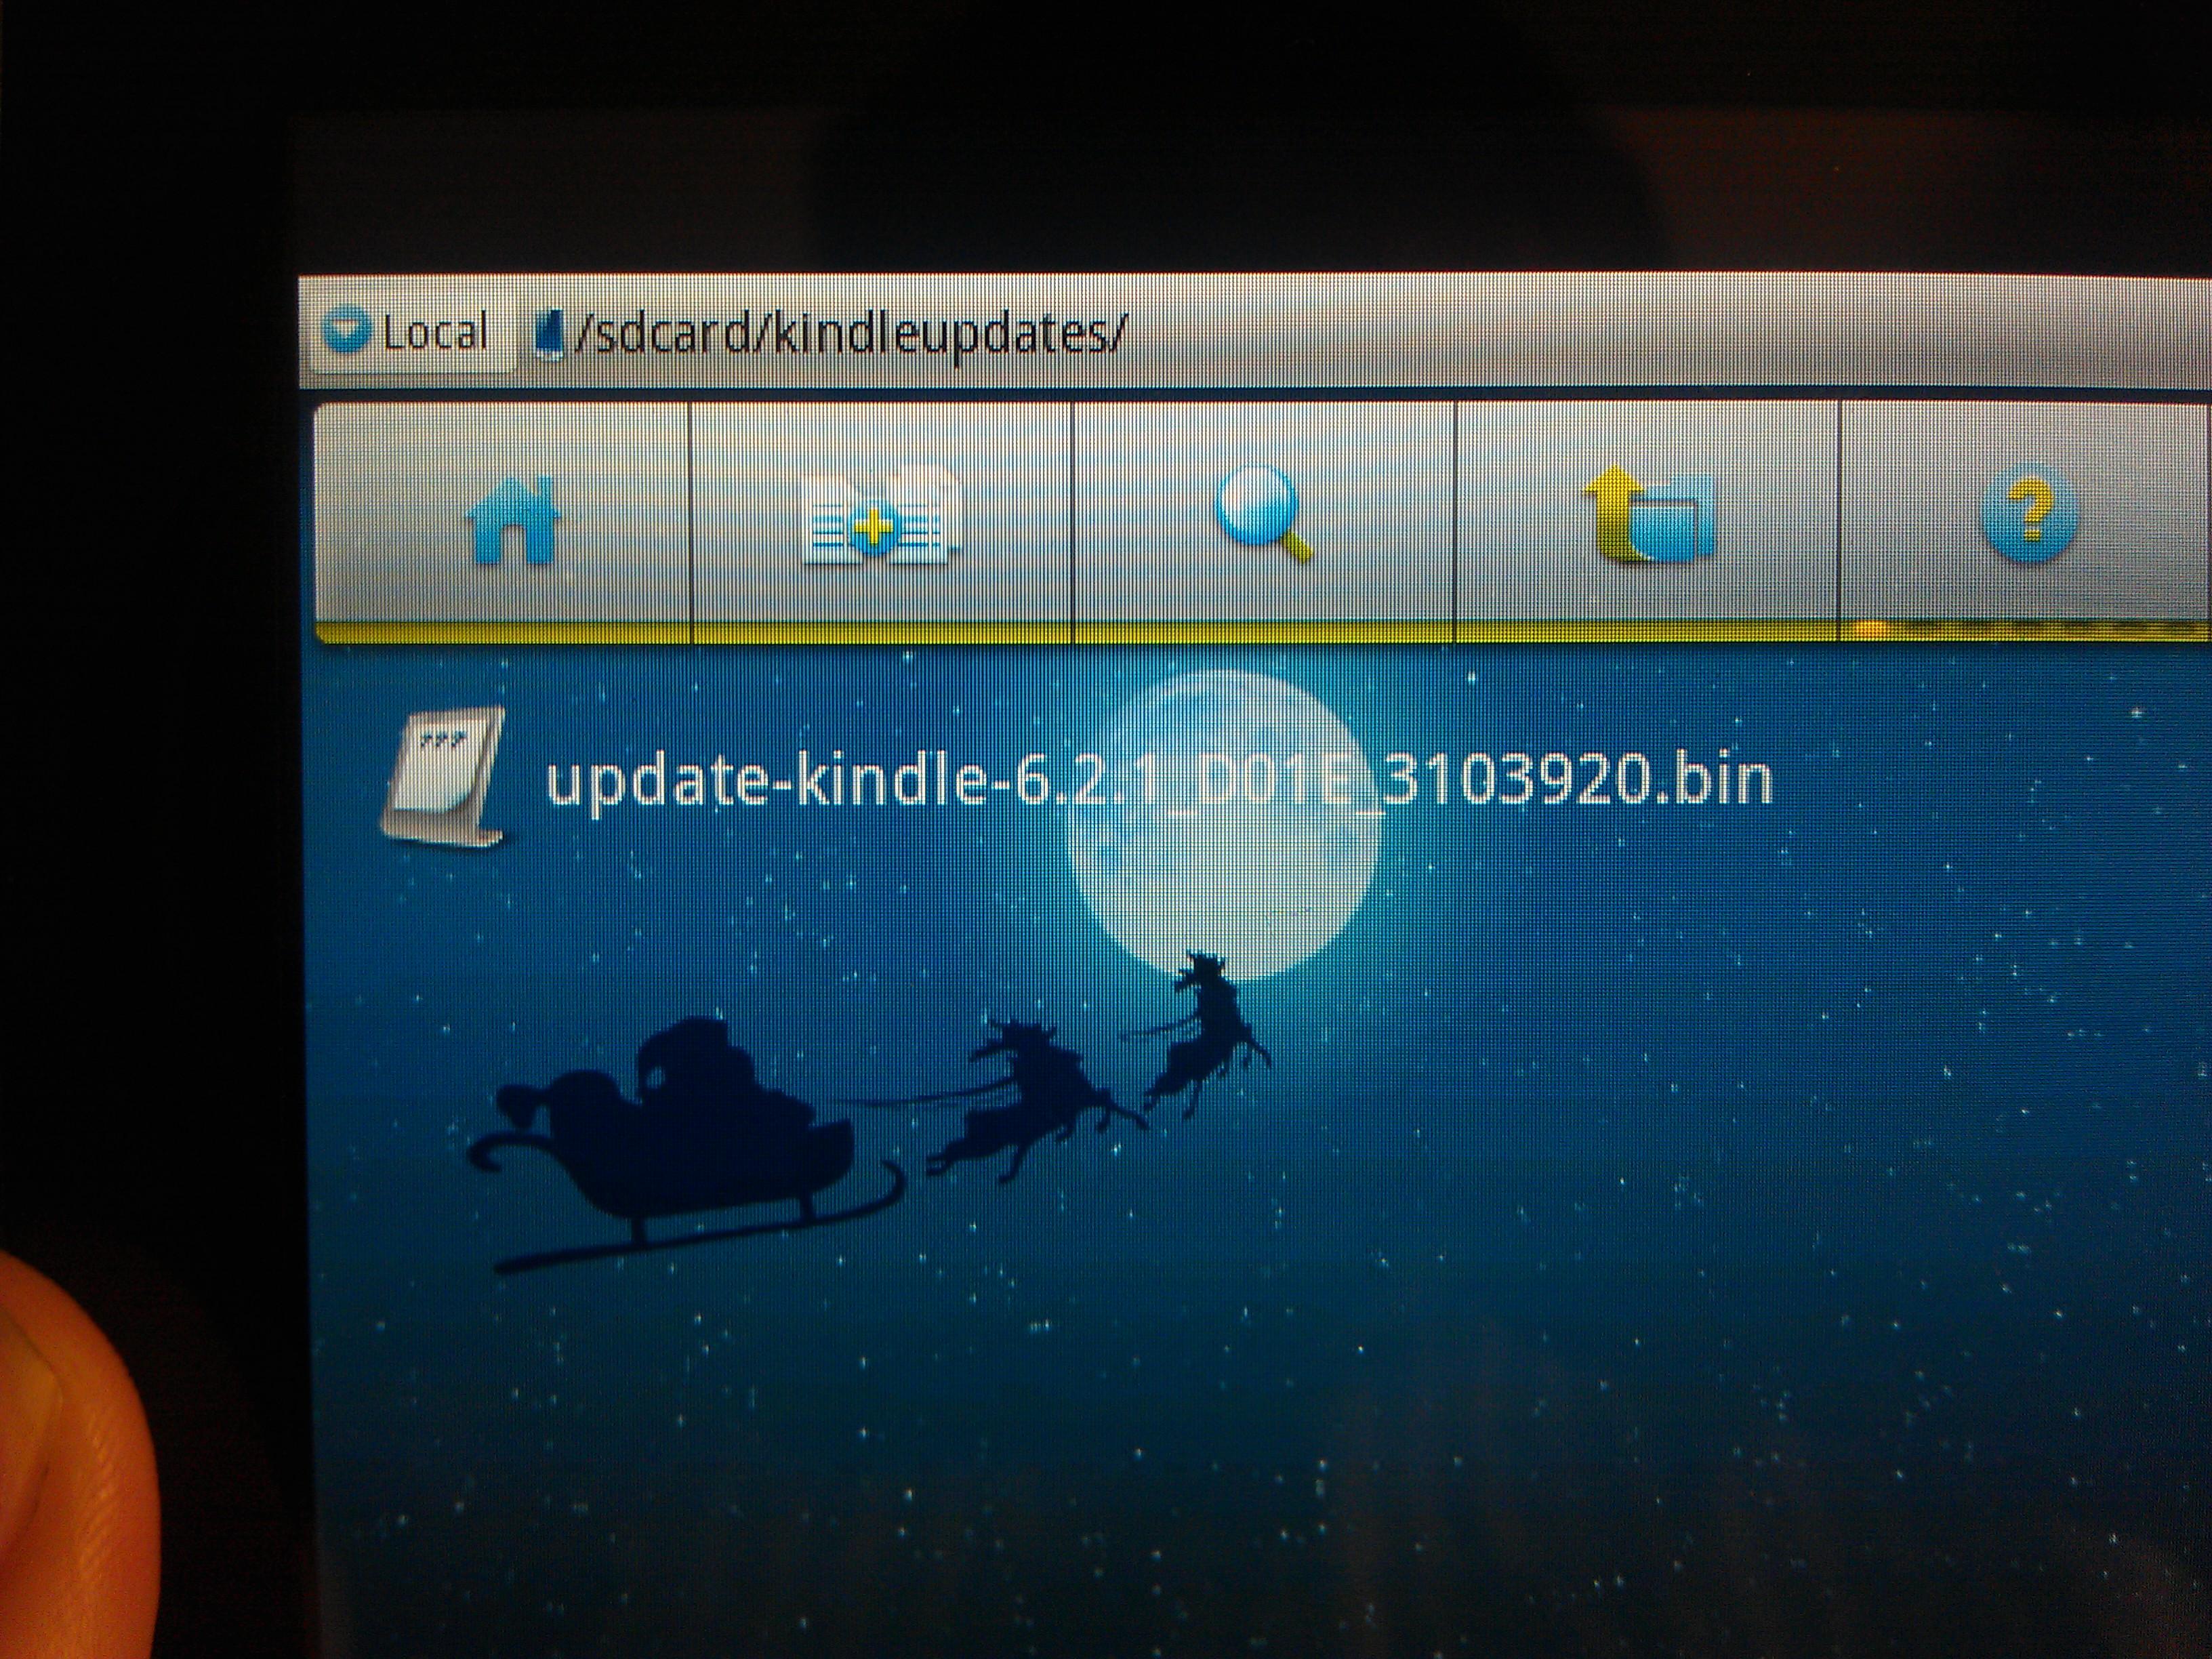 Kindle Fire Software Update in 'kindleupdates' Folder